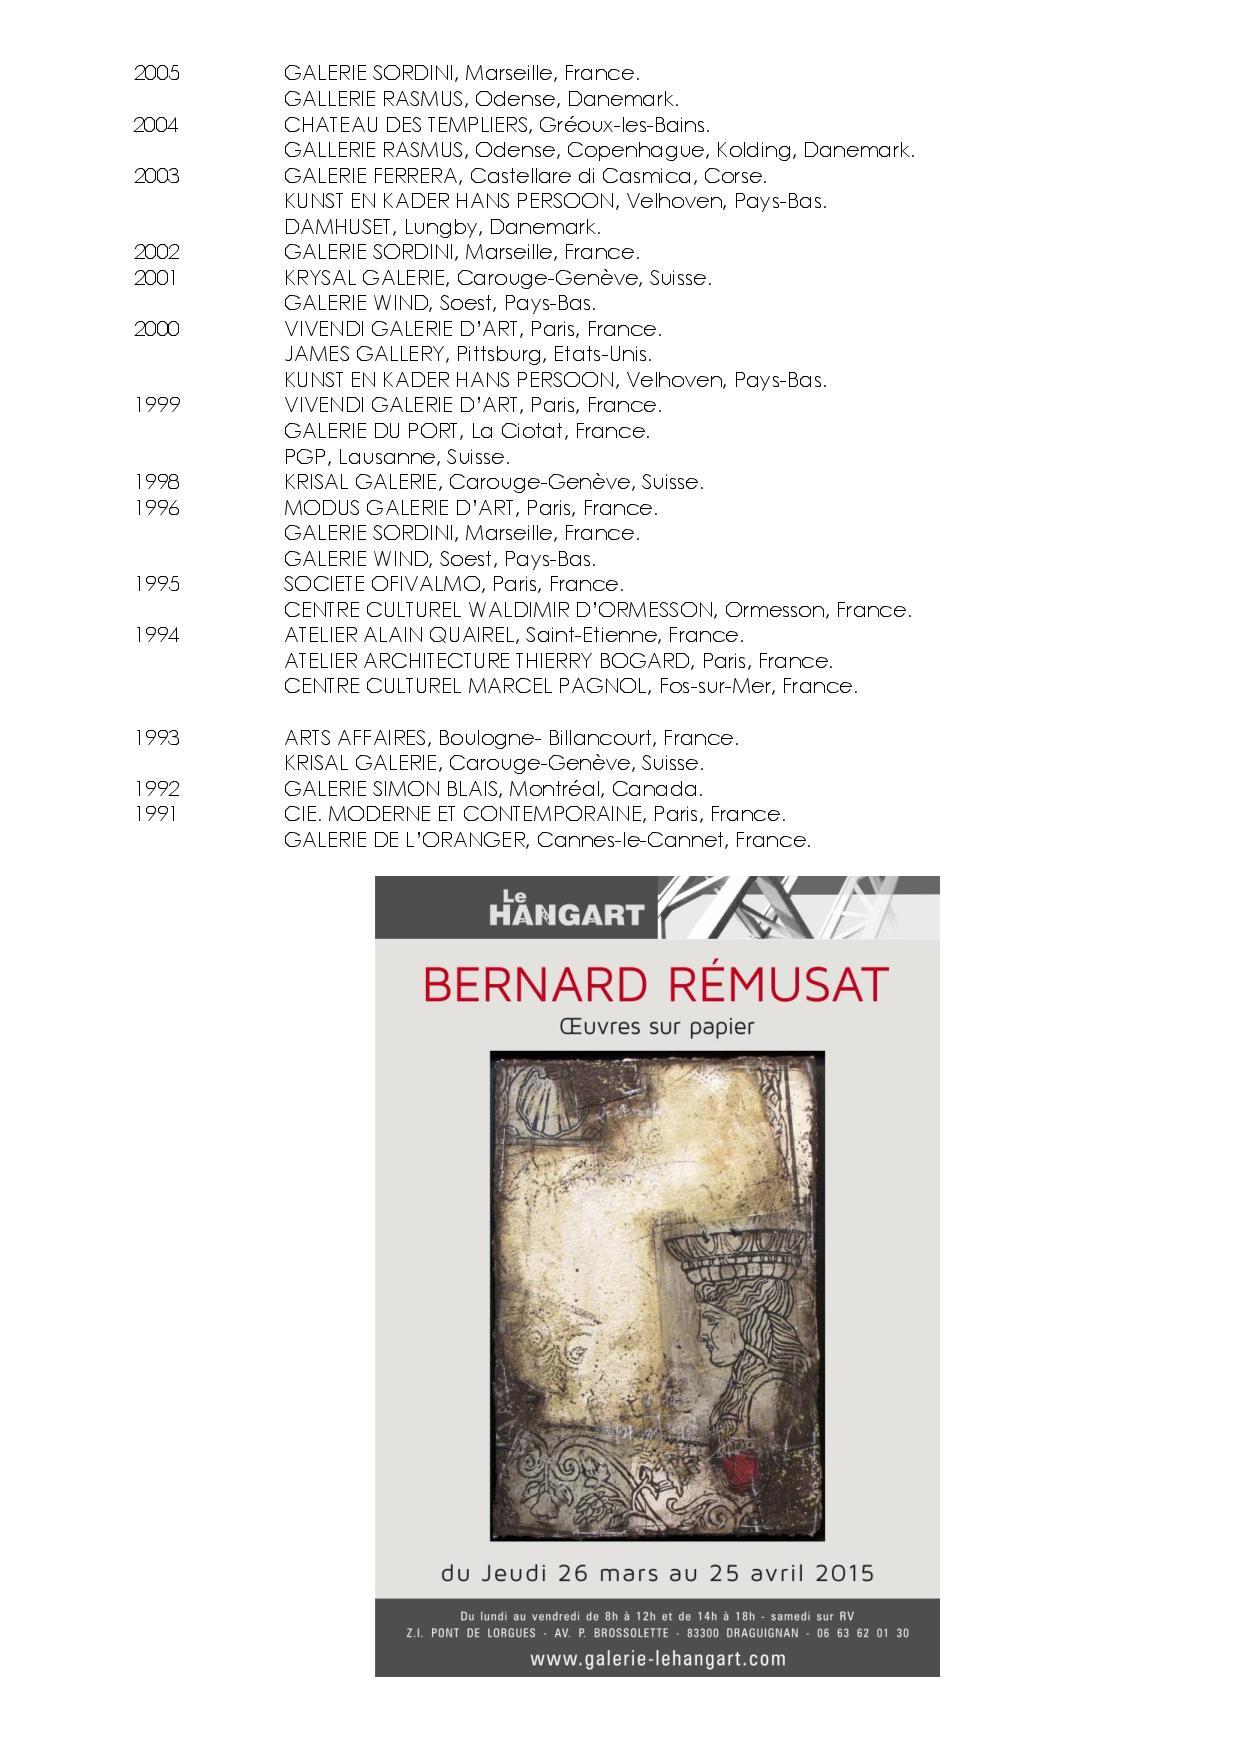 BROCHURE BERNARD REMUSAT-page-032